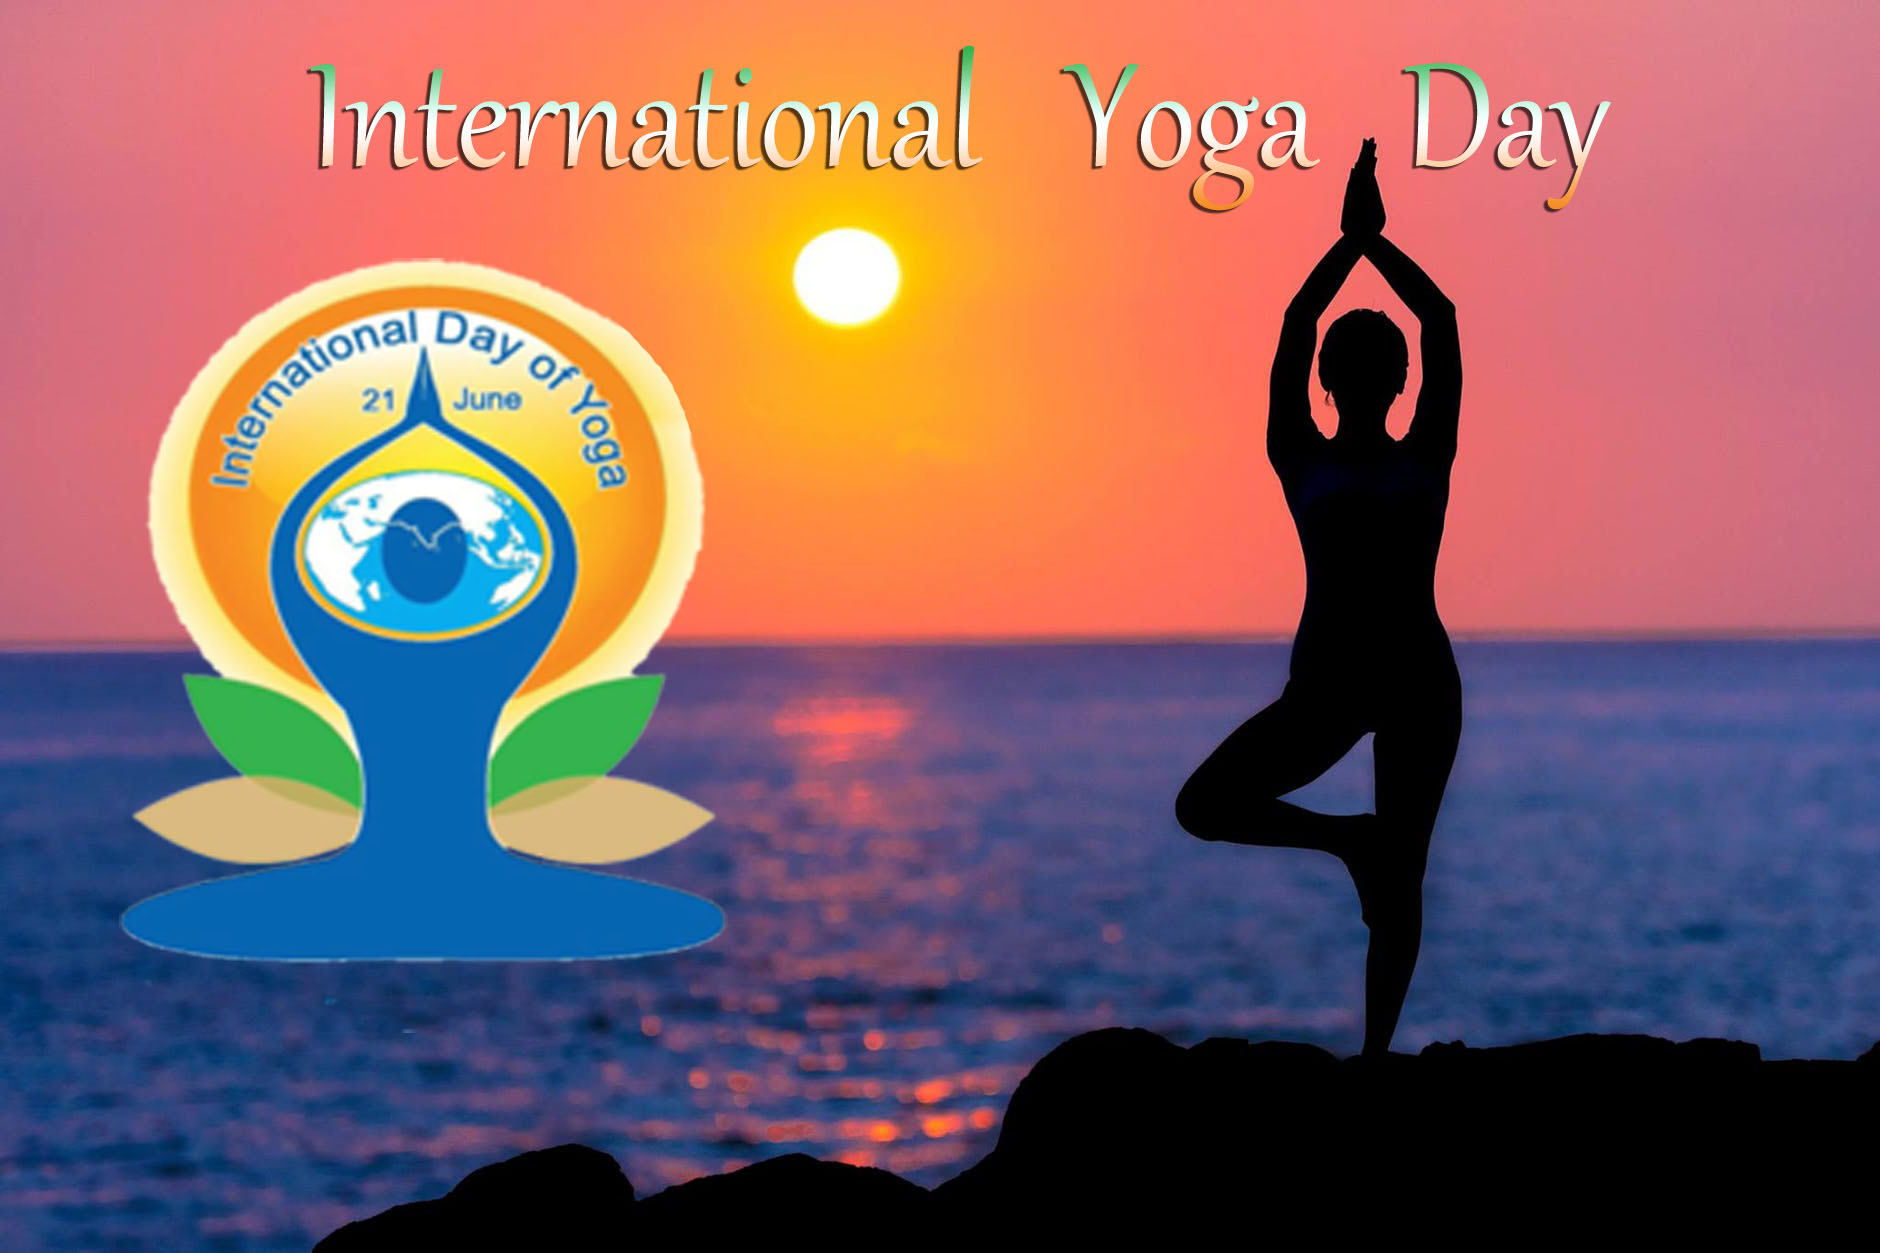 International Yoga Day – June 21